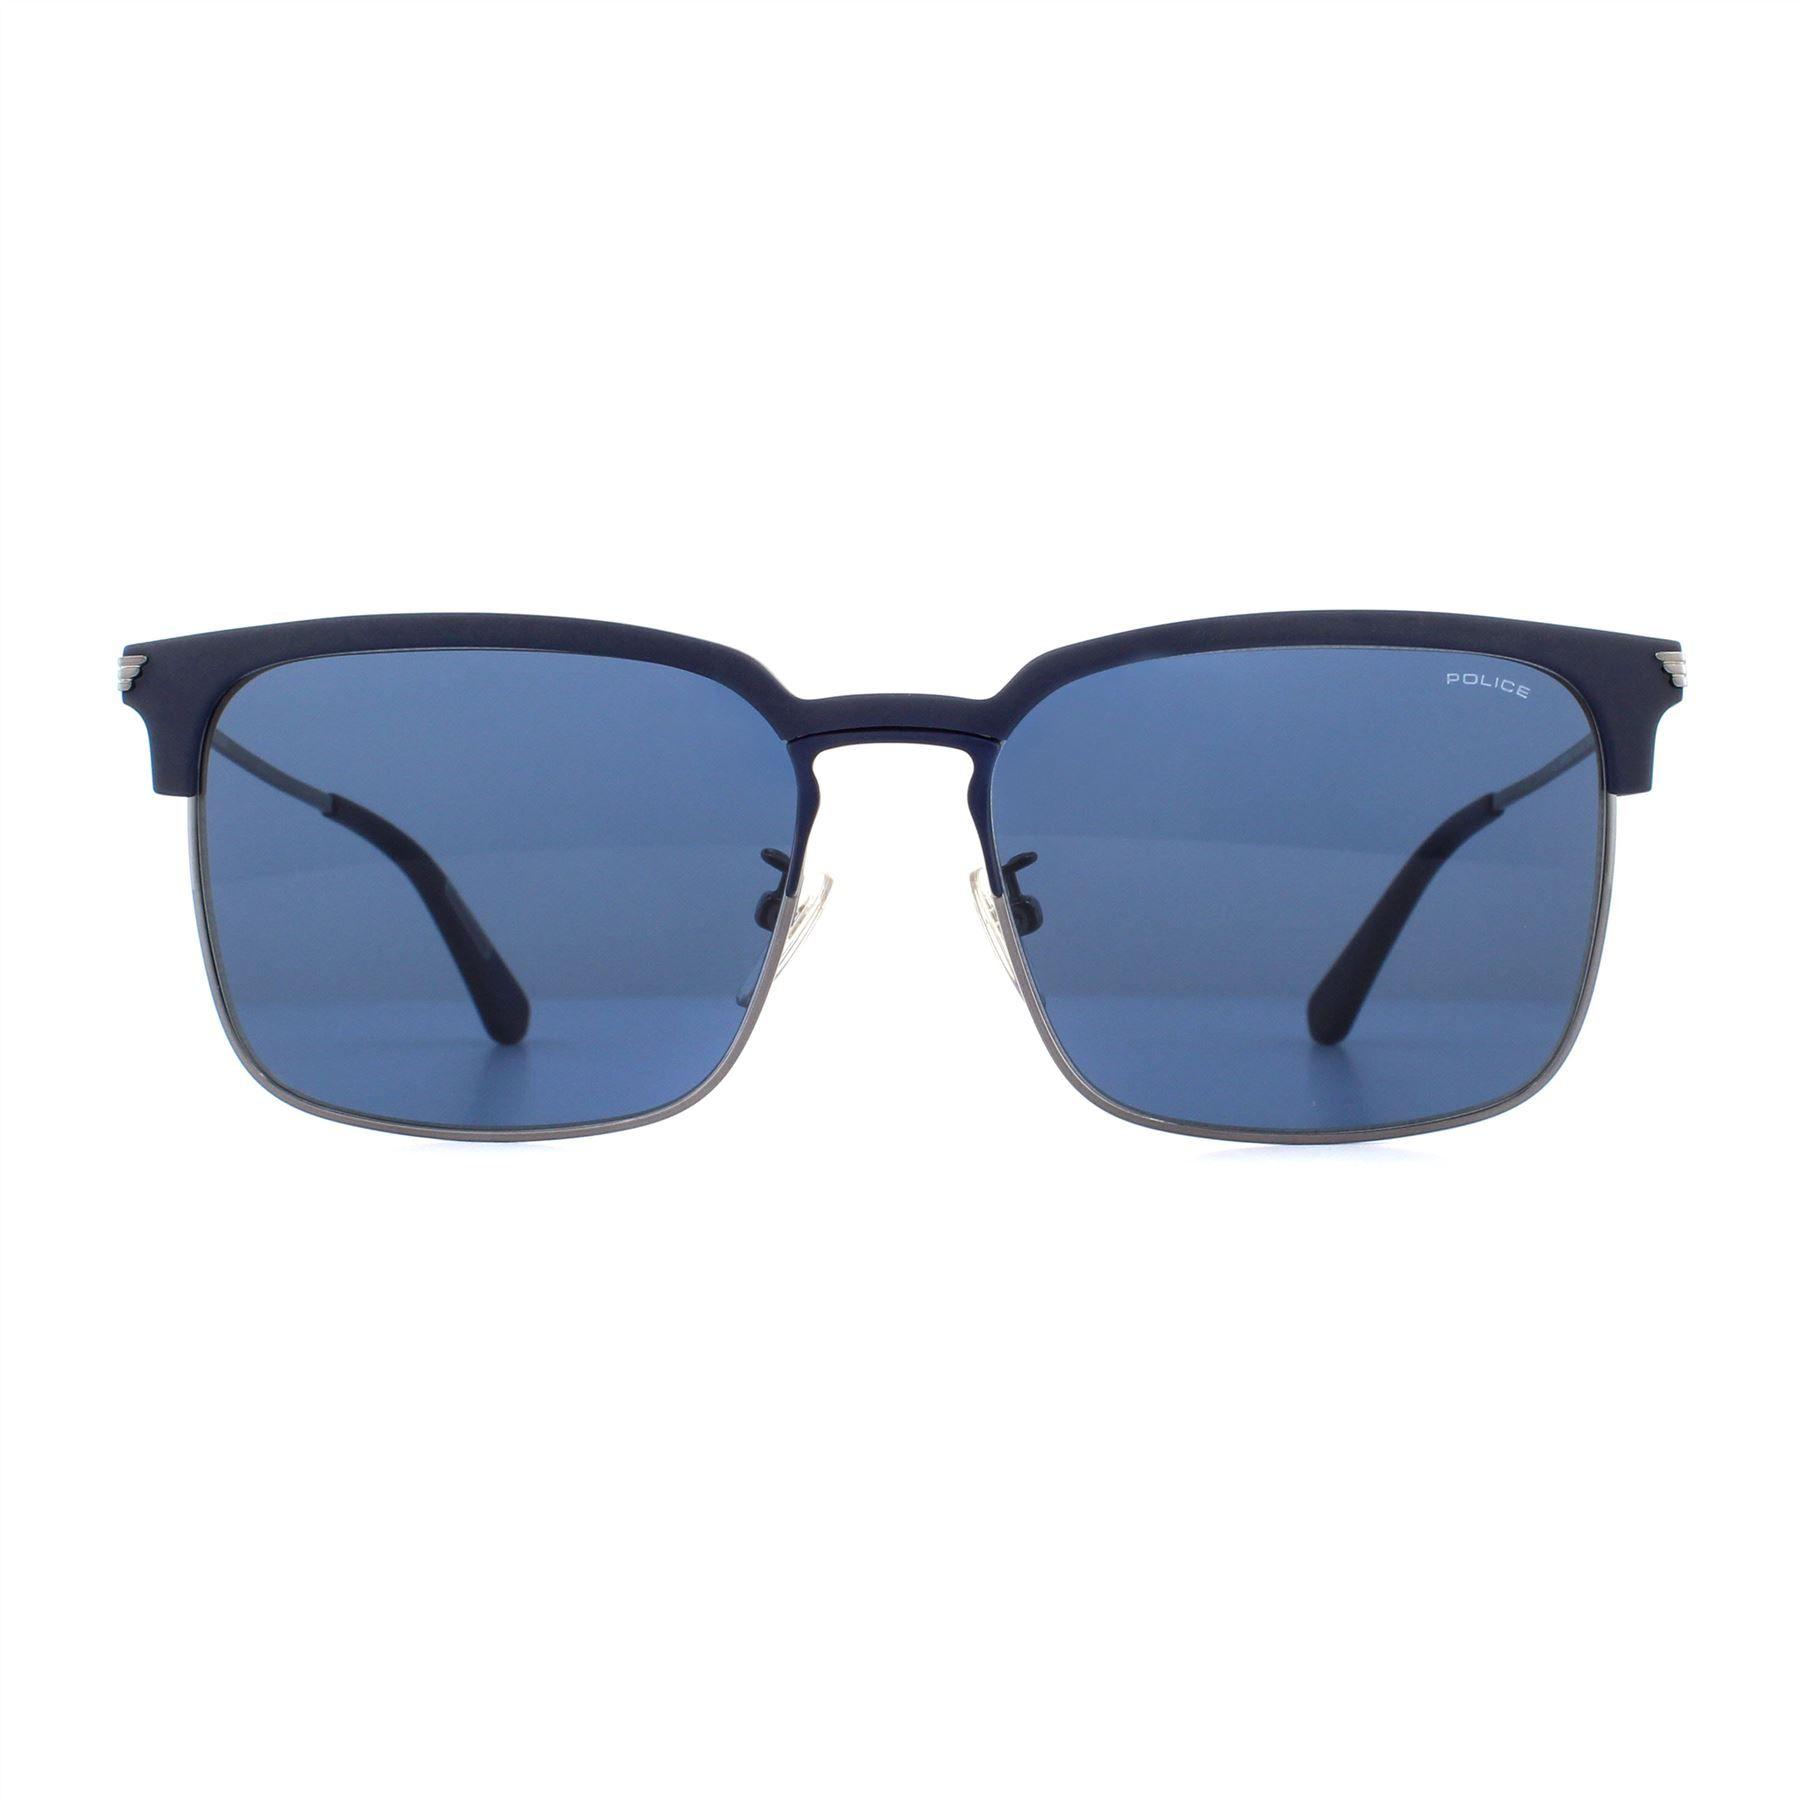 Police Sunglasses SPL576 Empire 2 0K53 Shiny Gunmetal Blue Blue